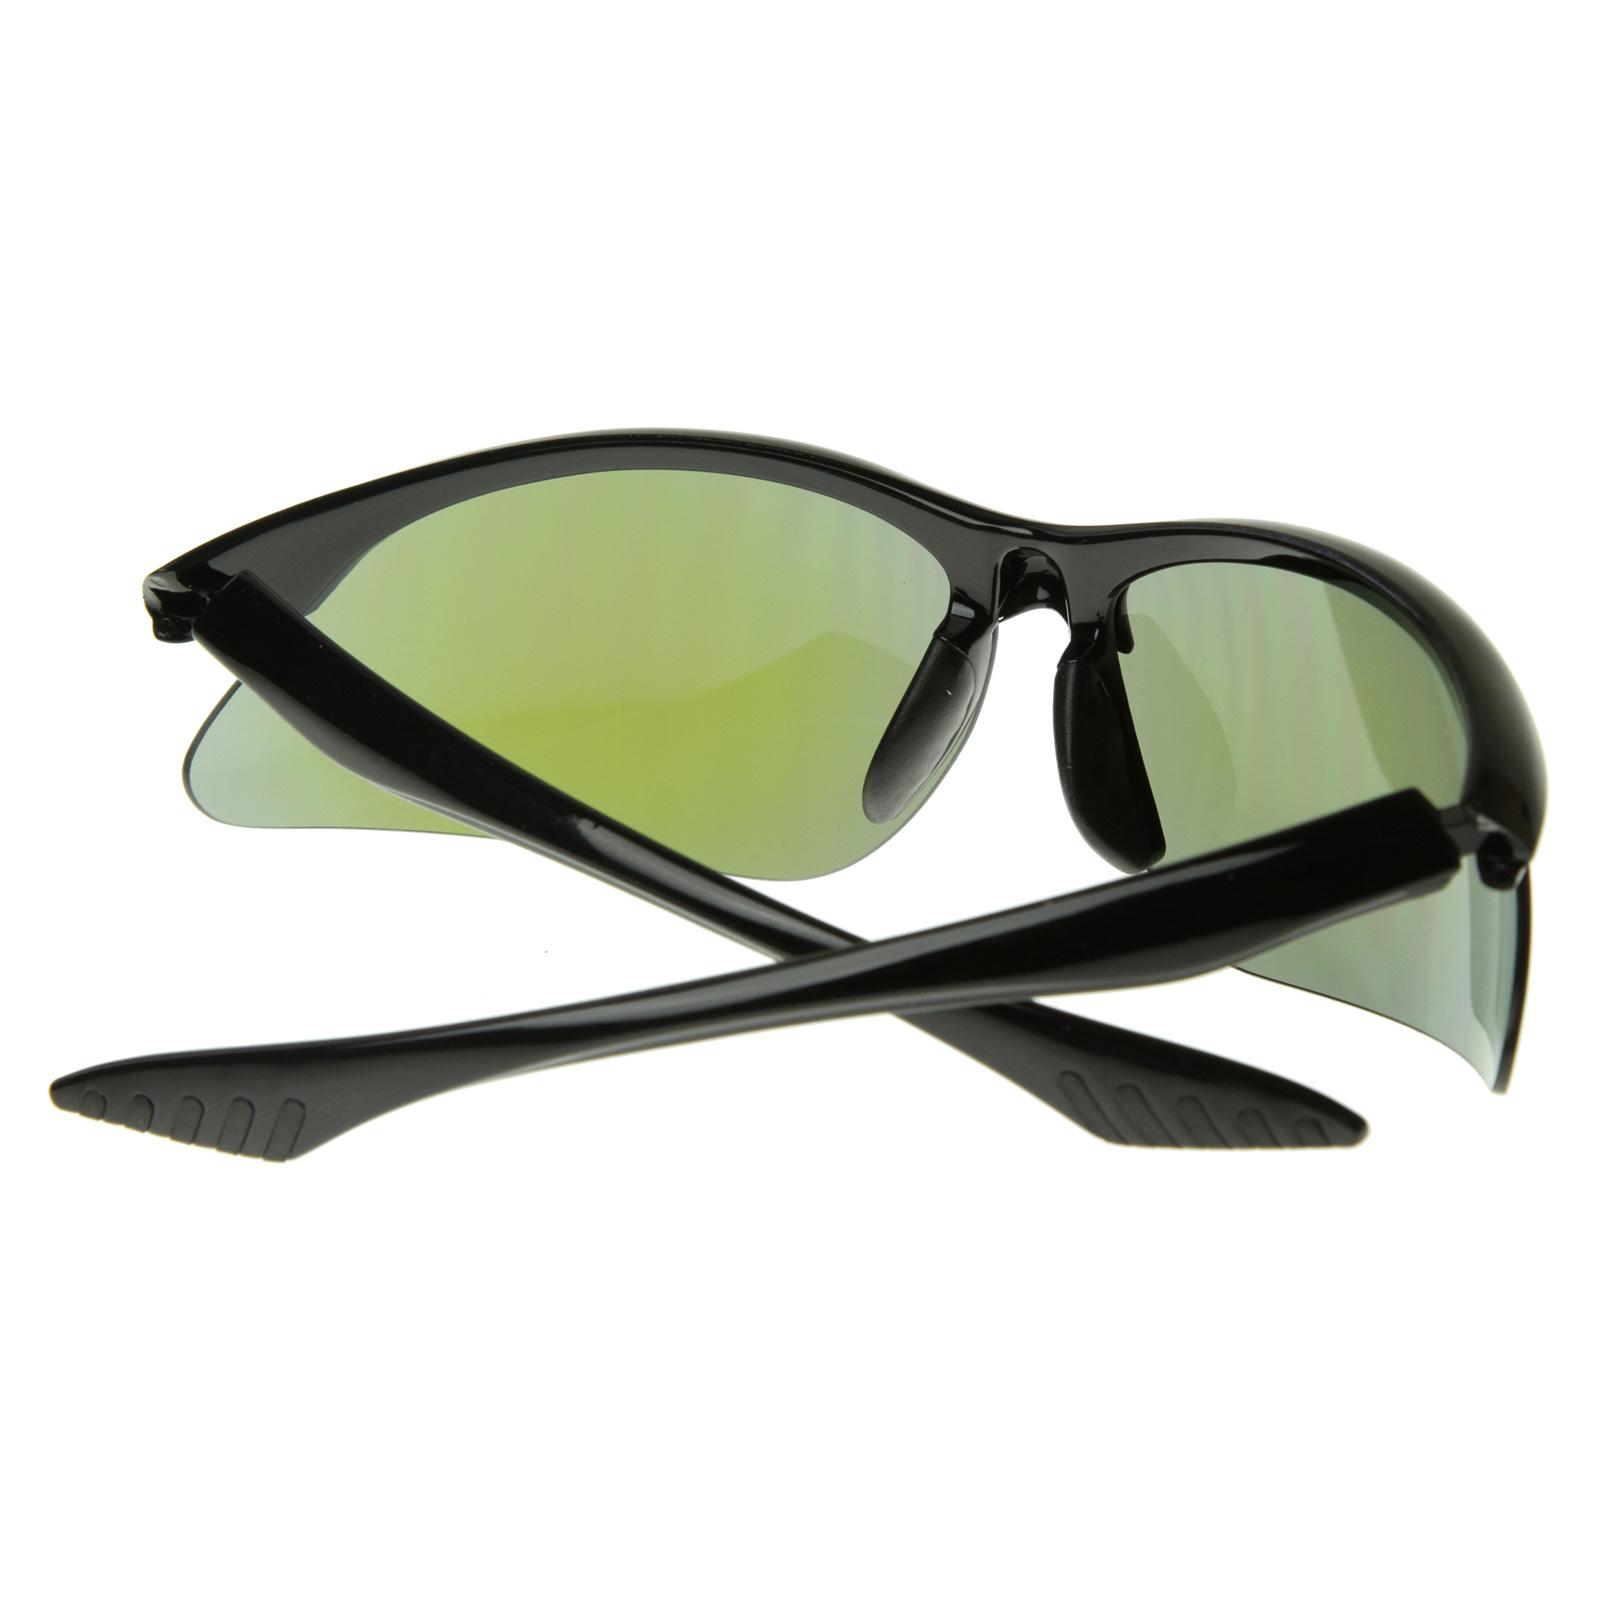 GOLF RIMLESS EYEGLASS FRAMES - Eyeglasses Online